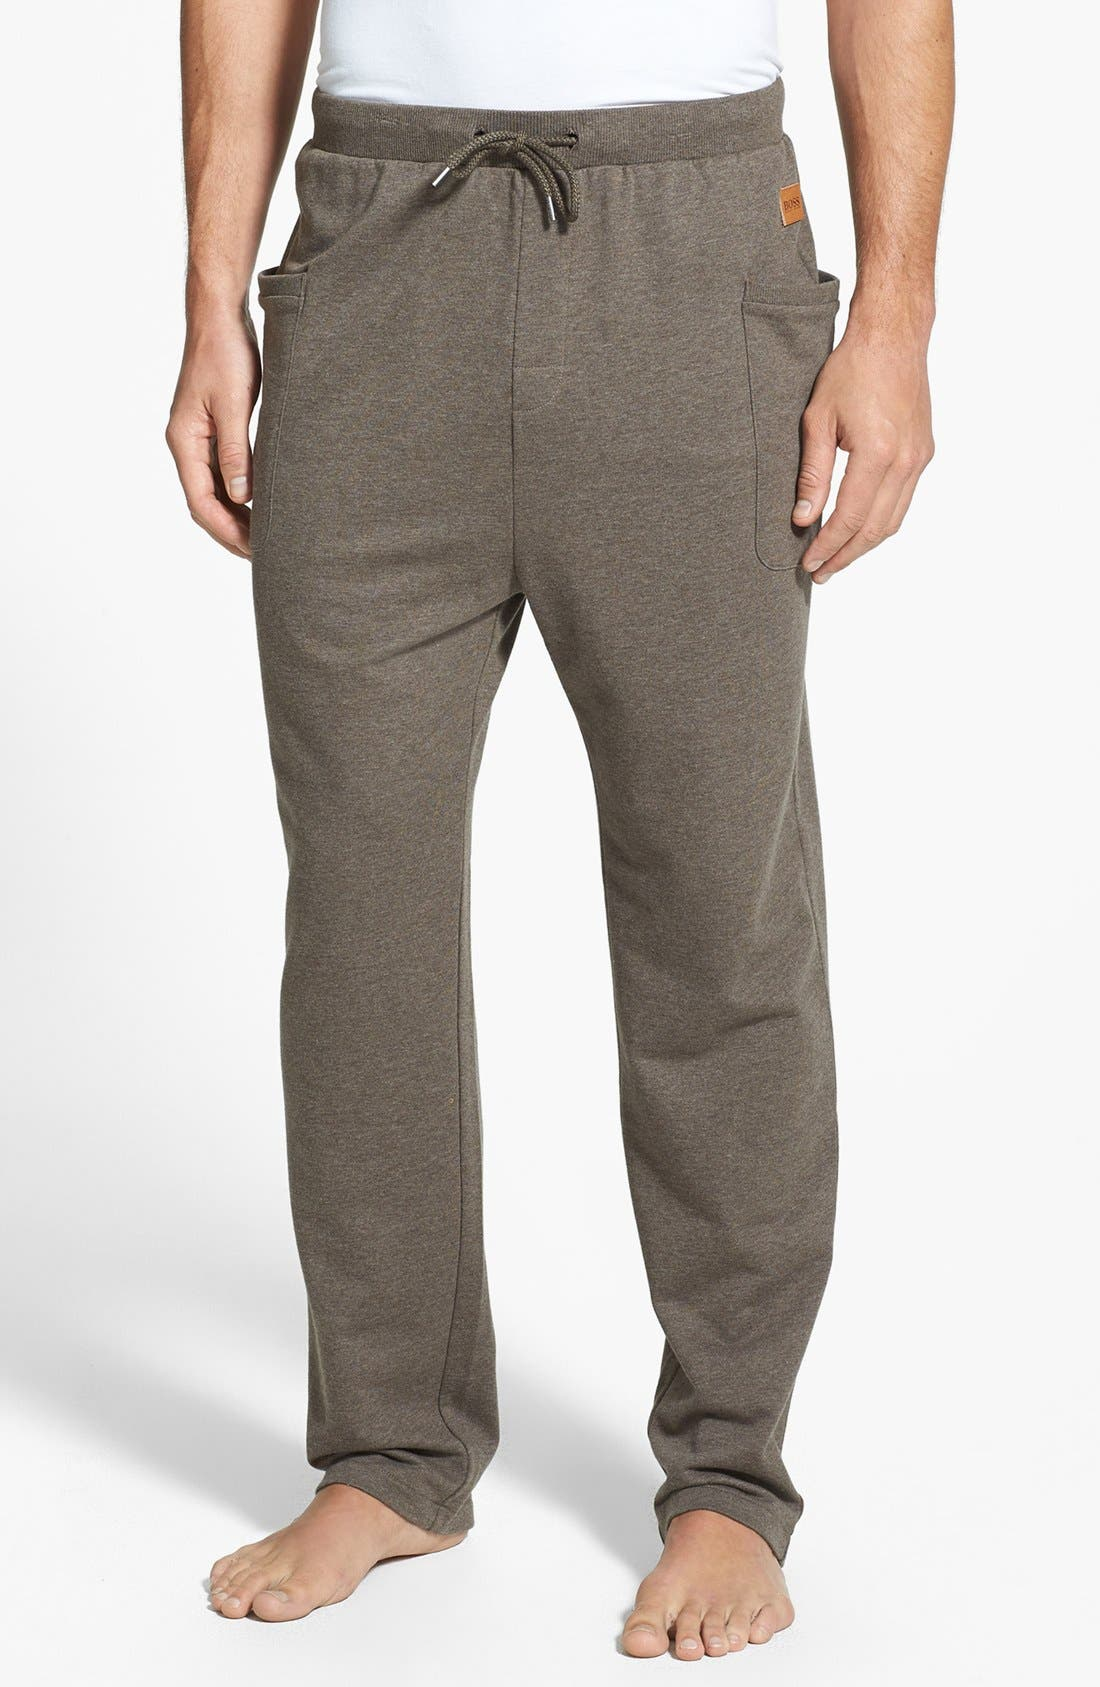 Alternate Image 1 Selected - BOSS HUGO BOSS 'Innovation 6' Lounge Pants